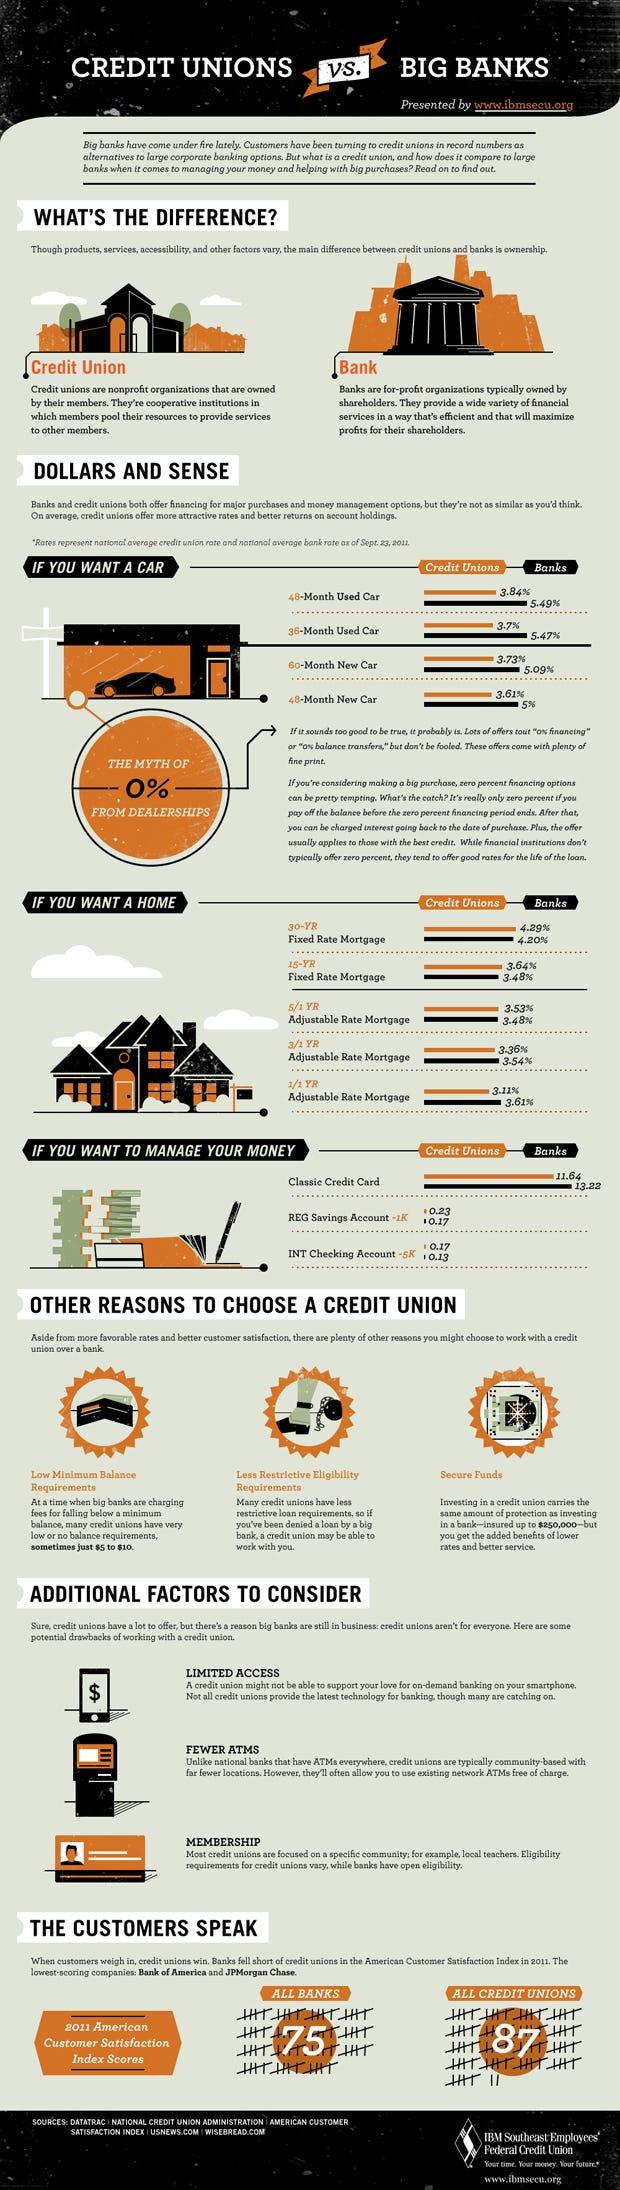 Credit Unions Vs Banks